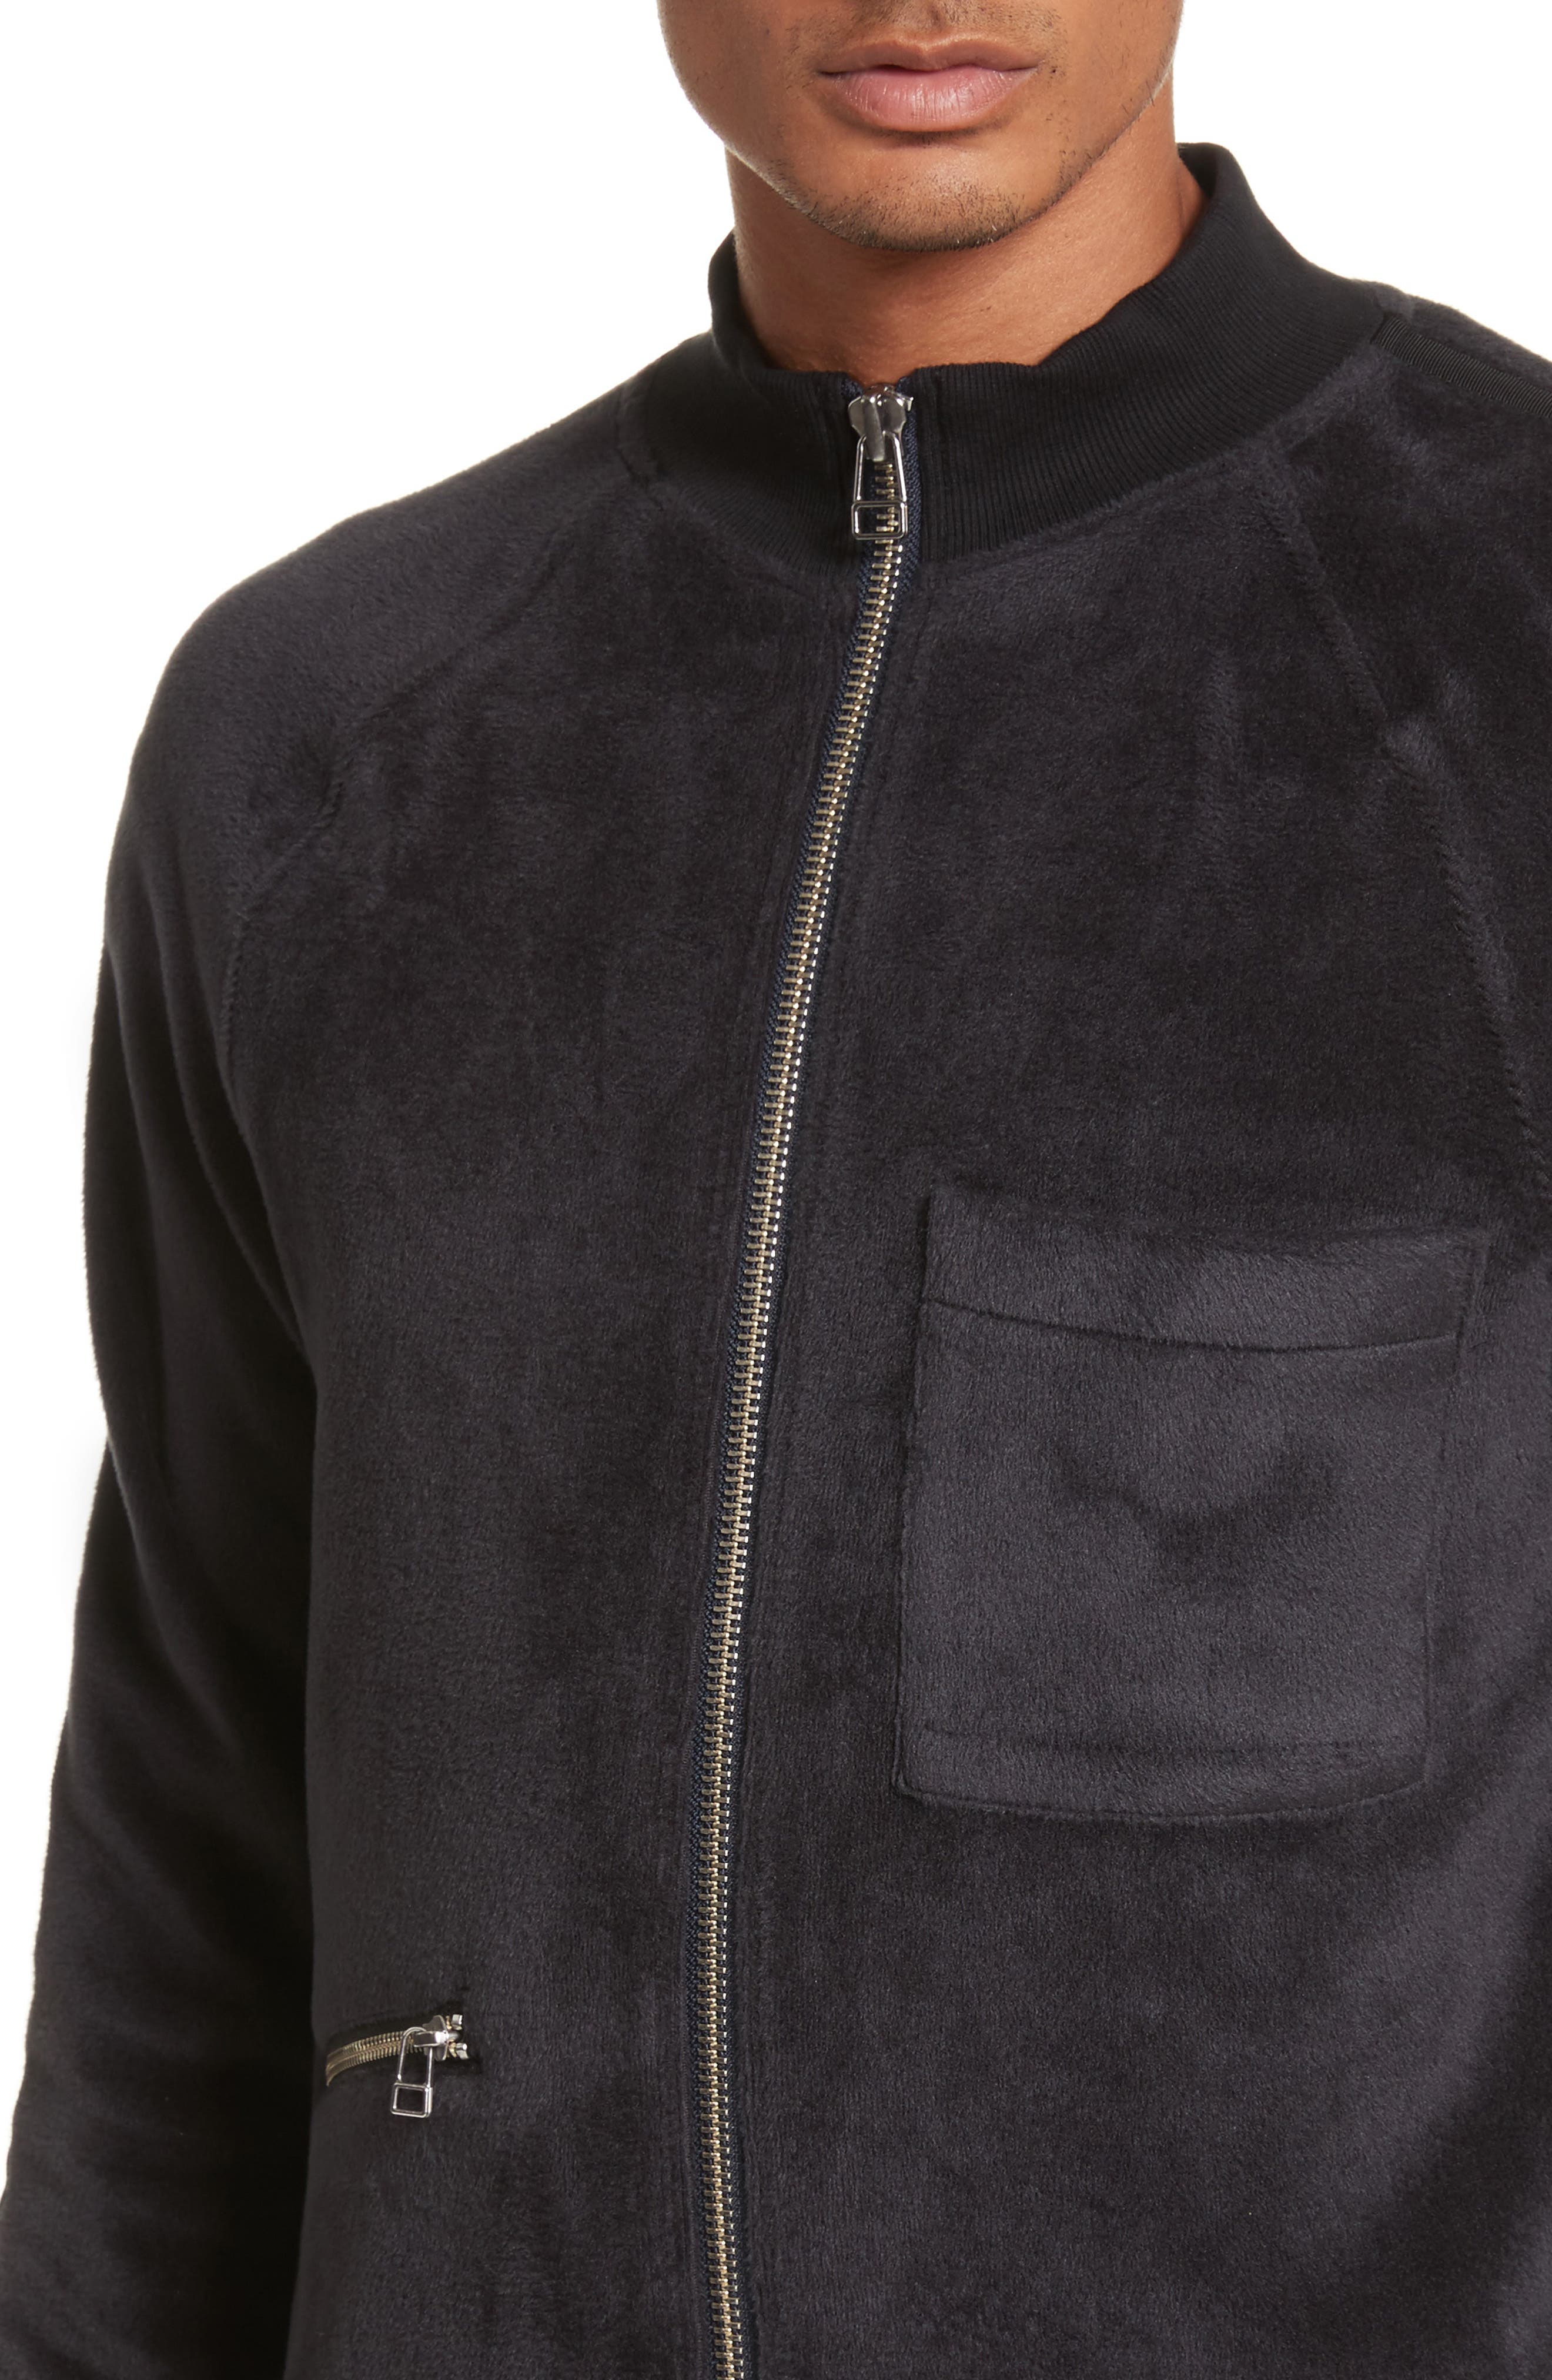 Velour Zip Jacket,                             Alternate thumbnail 4, color,                             Faded Blue